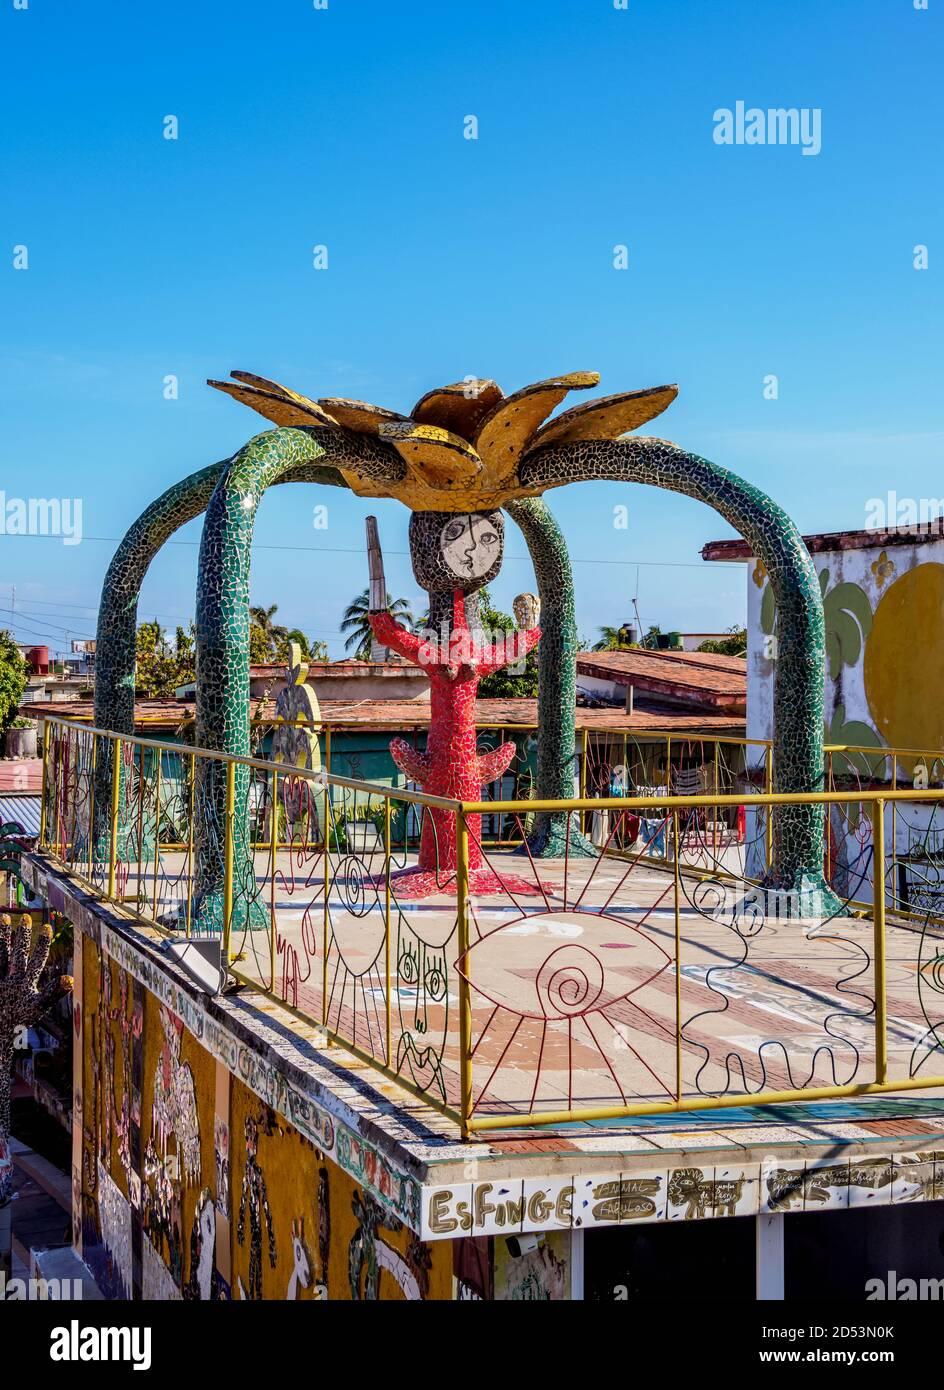 House of Fuster, Fusterlandia, Jaimanitas Neighbourhood, Playa District, Havana, La Habana Province, Cuba Stock Photo